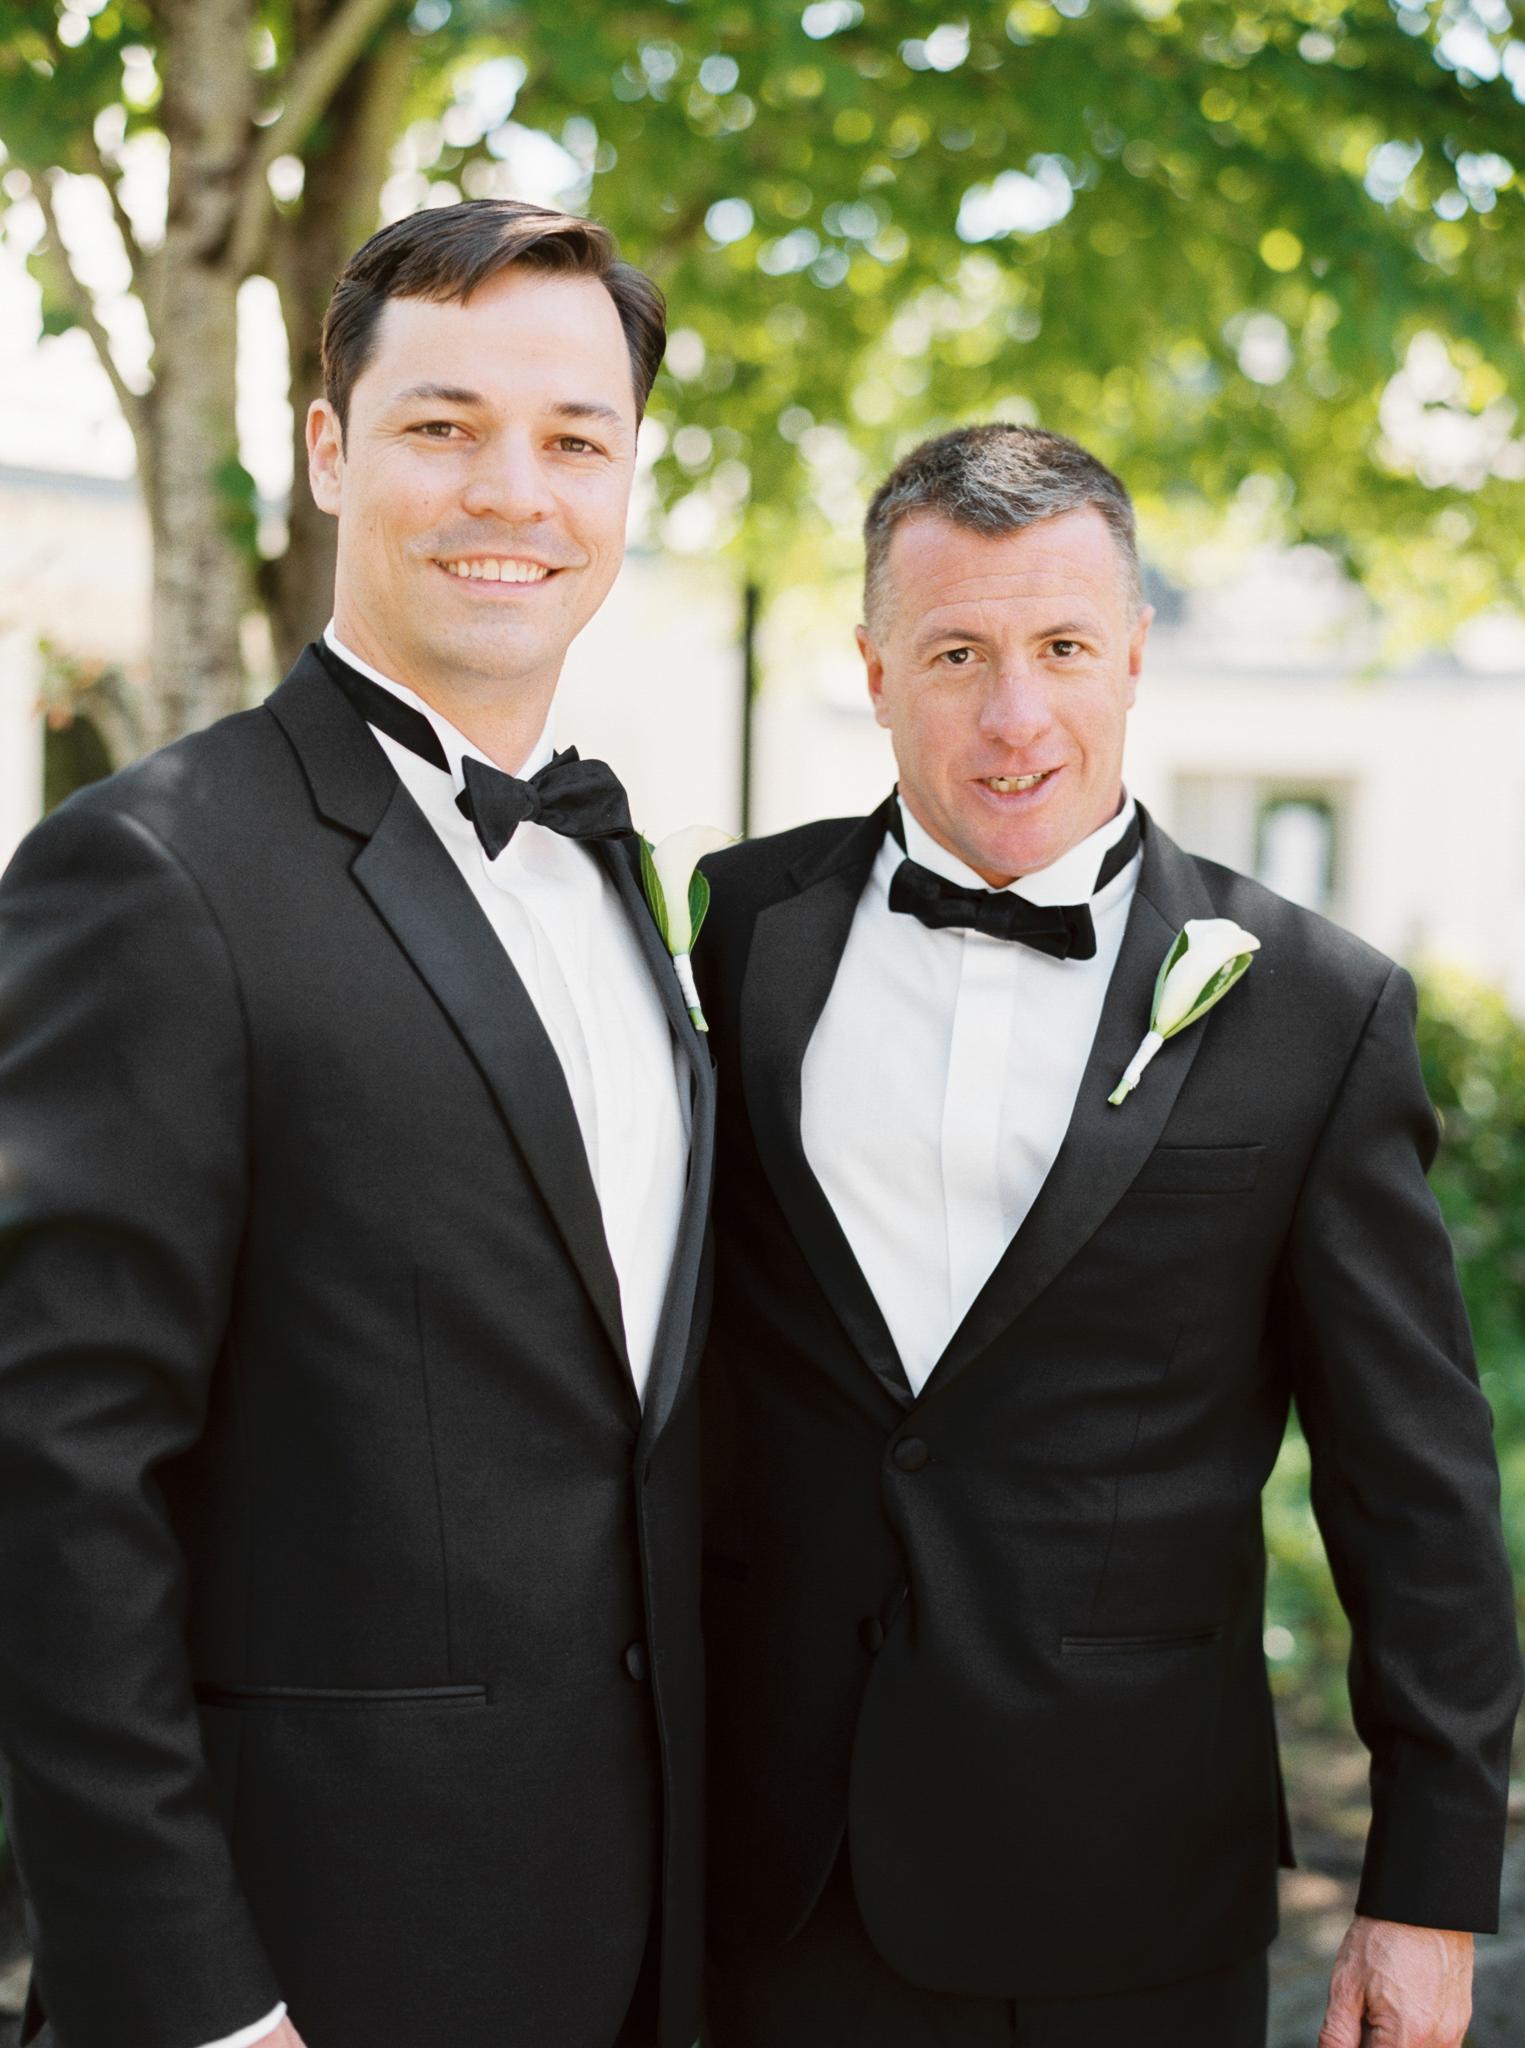 068OutliveCreative_Travel_Photographer_Videographer_Lewis&Clark_Oregon_Elegant_BlackTie_Destination_Wedding.jpg